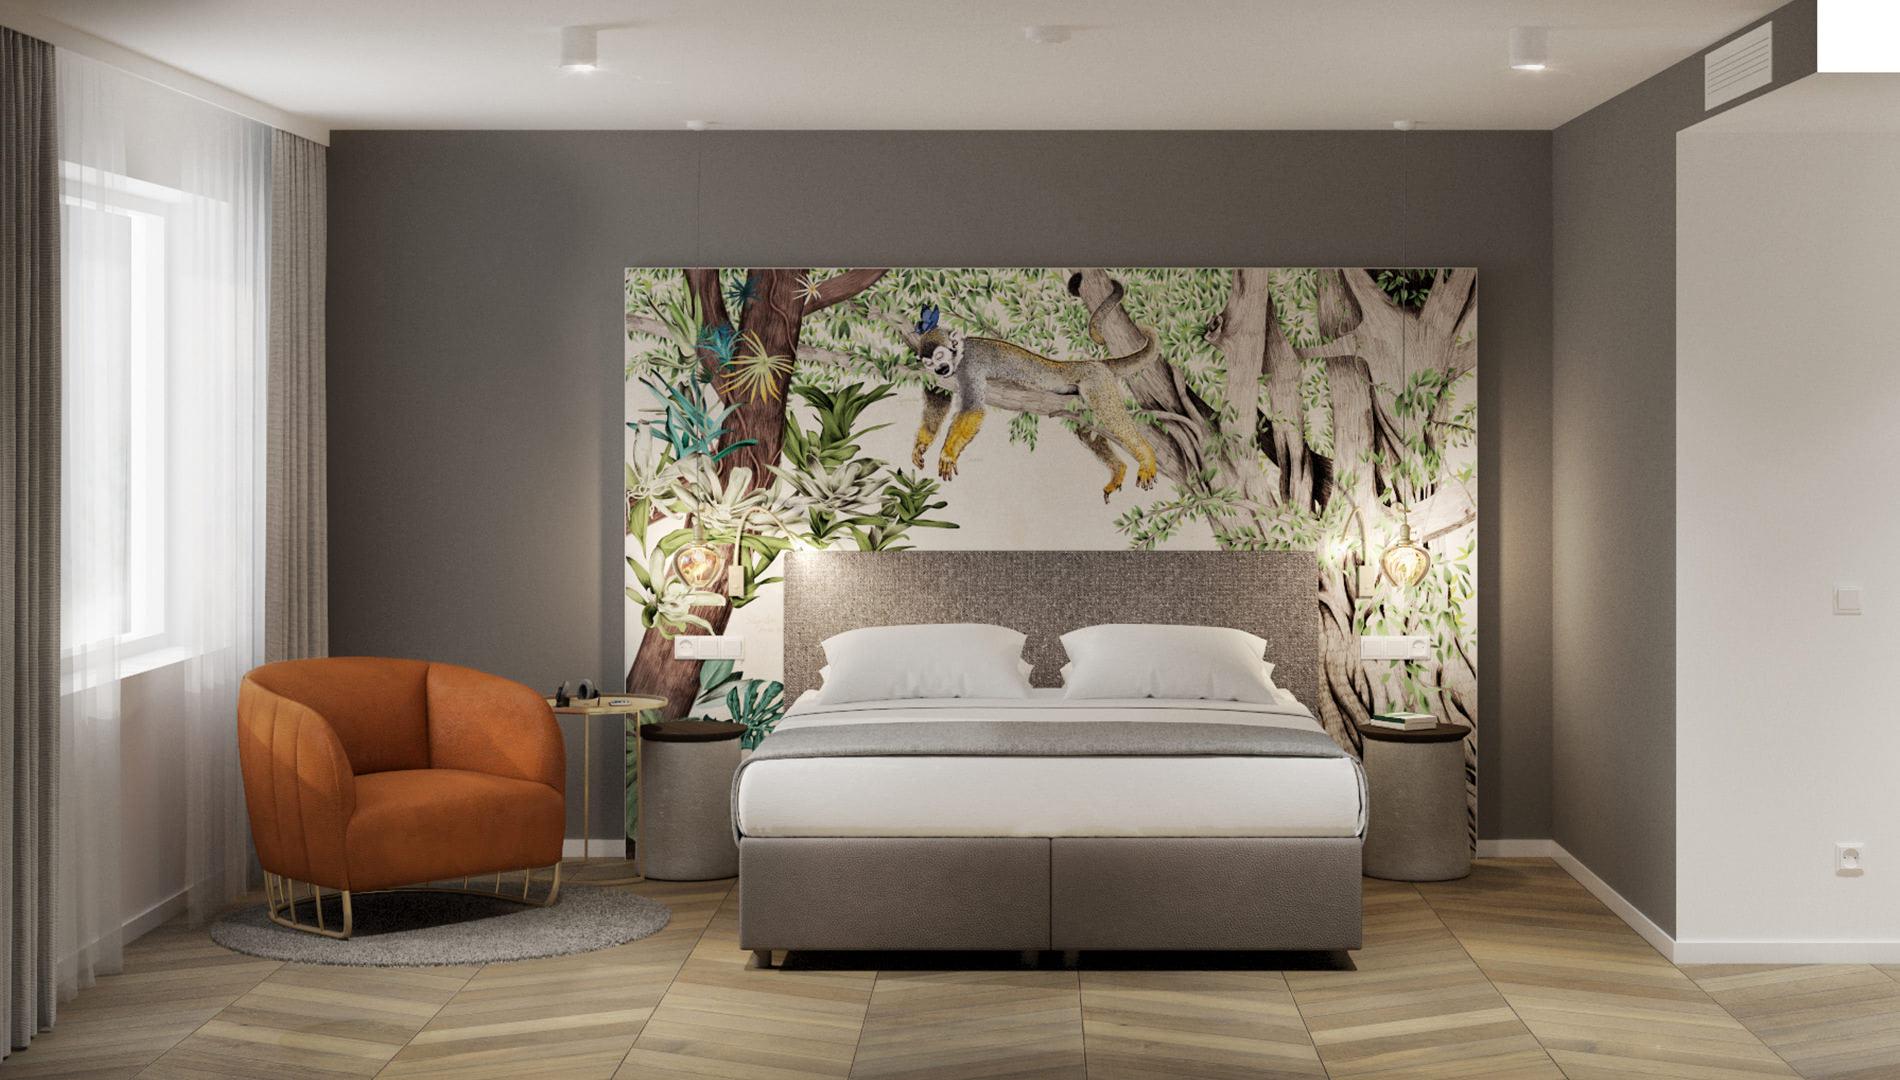 Destinationsentwicklung Ninety Nine Hotels Wuppertal Hotel Design Hotelzimmer Bett Going Places